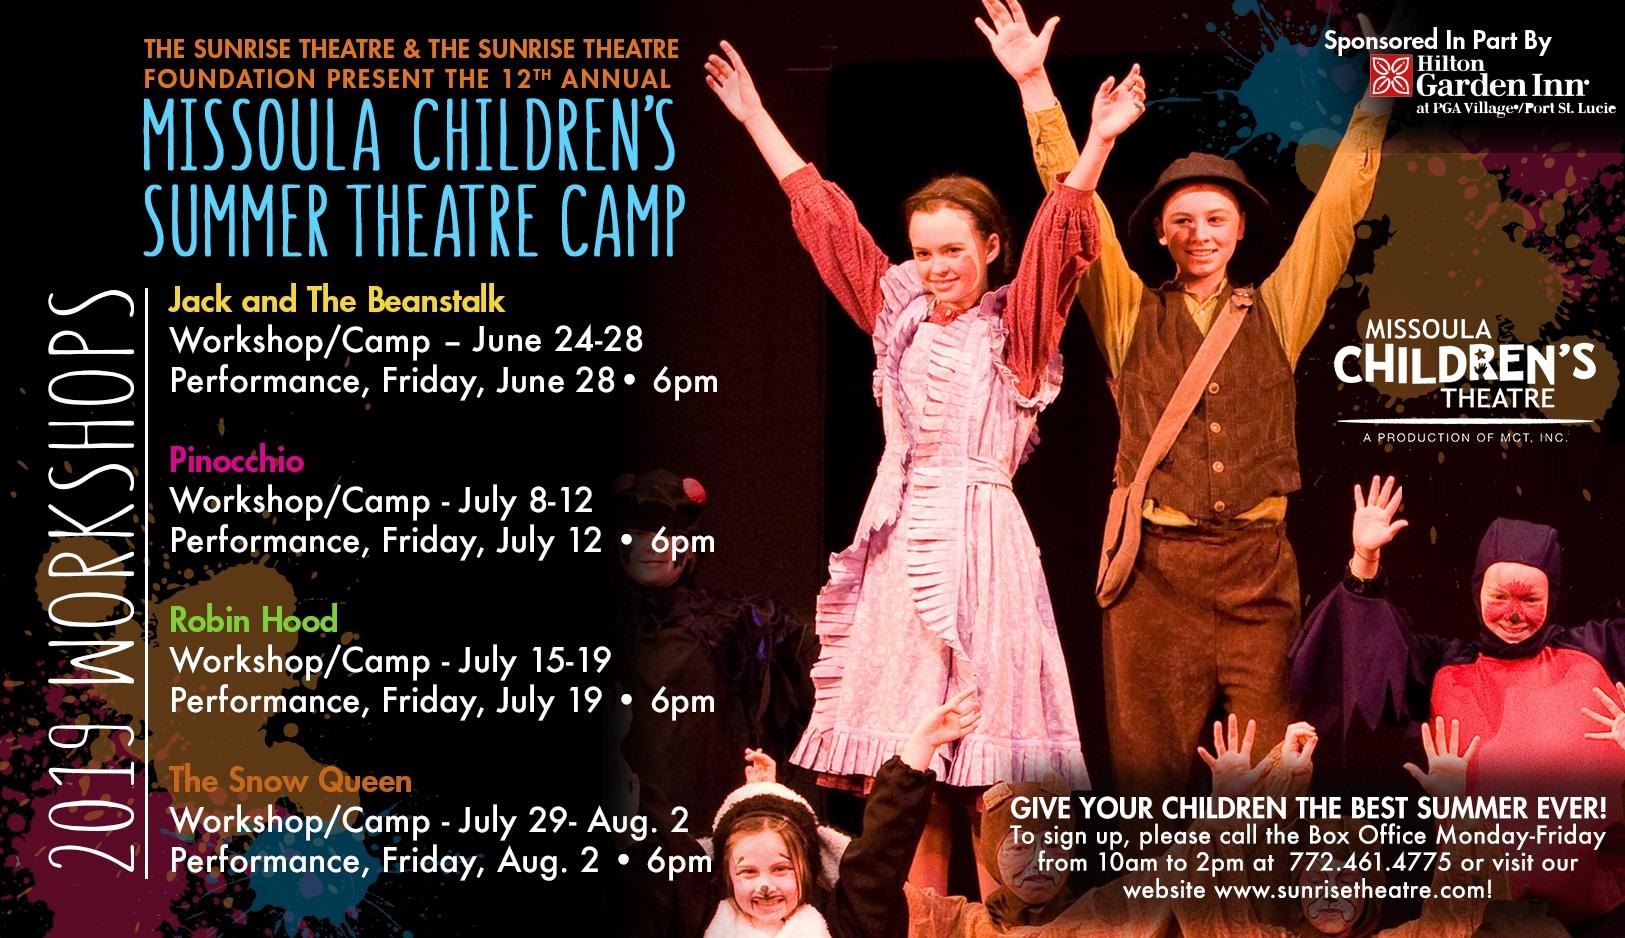 Missoula Children's Theatre Summer Camp